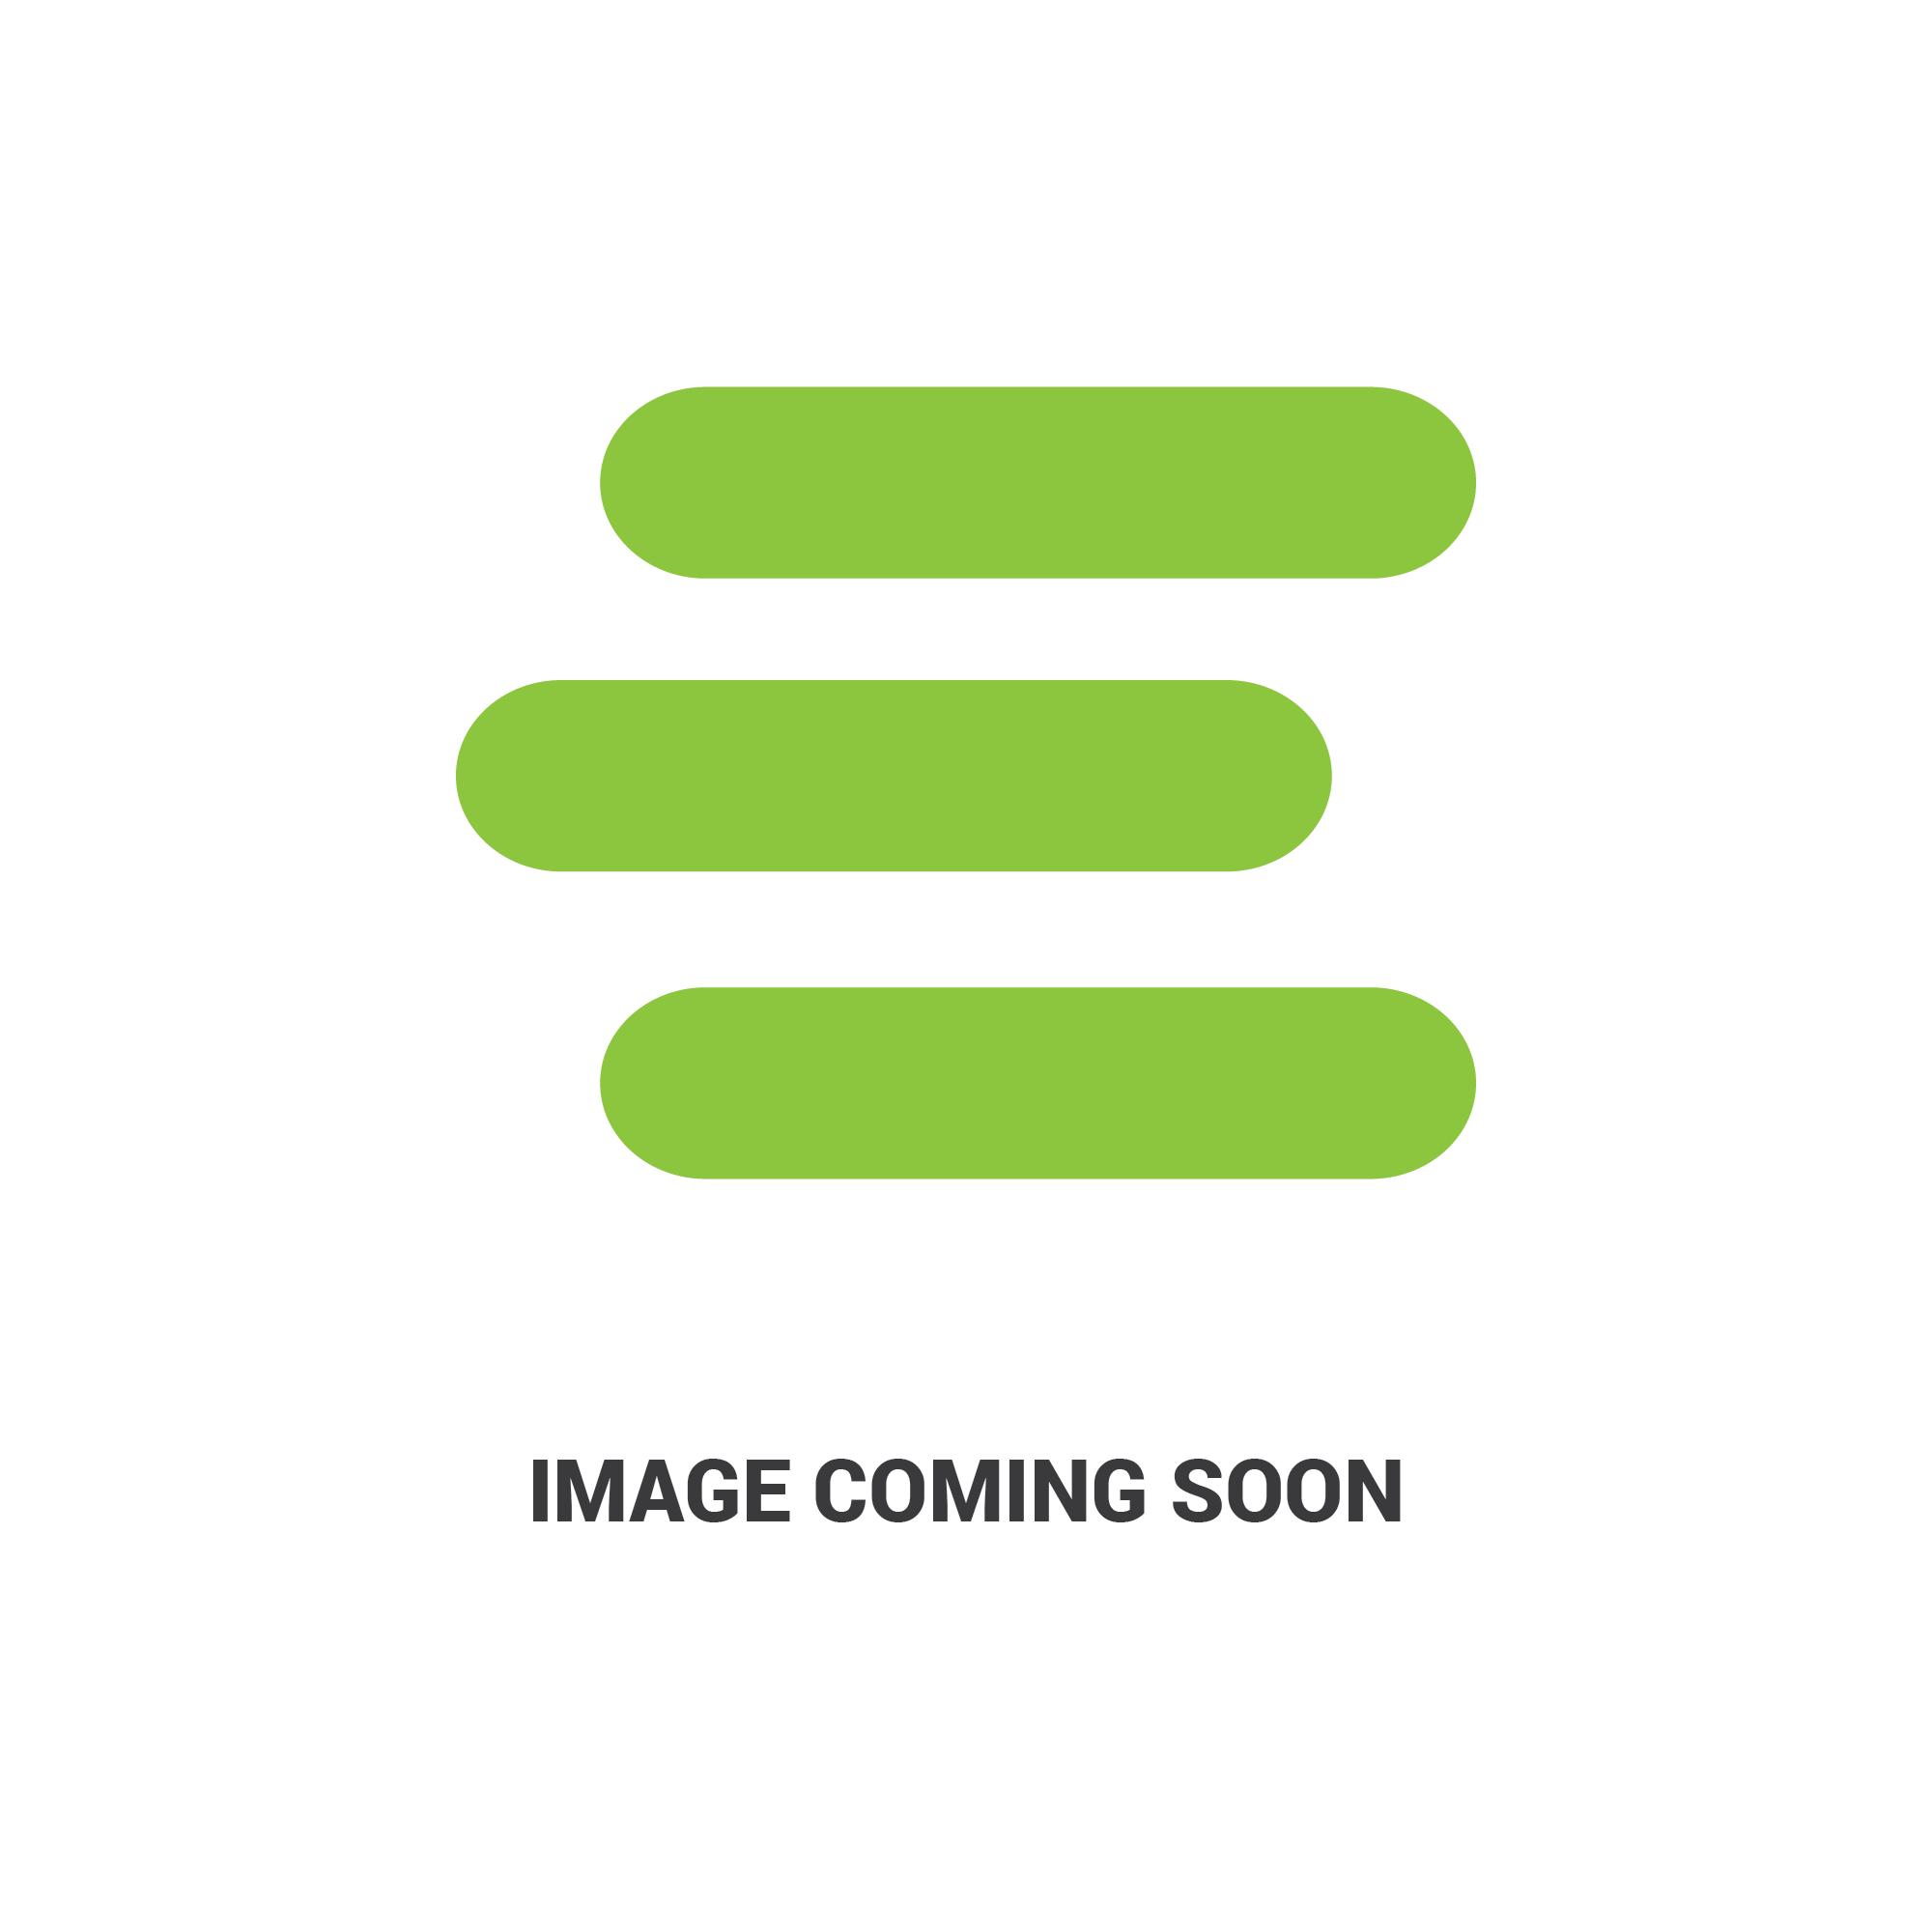 E-66103-459221981_1.jpg